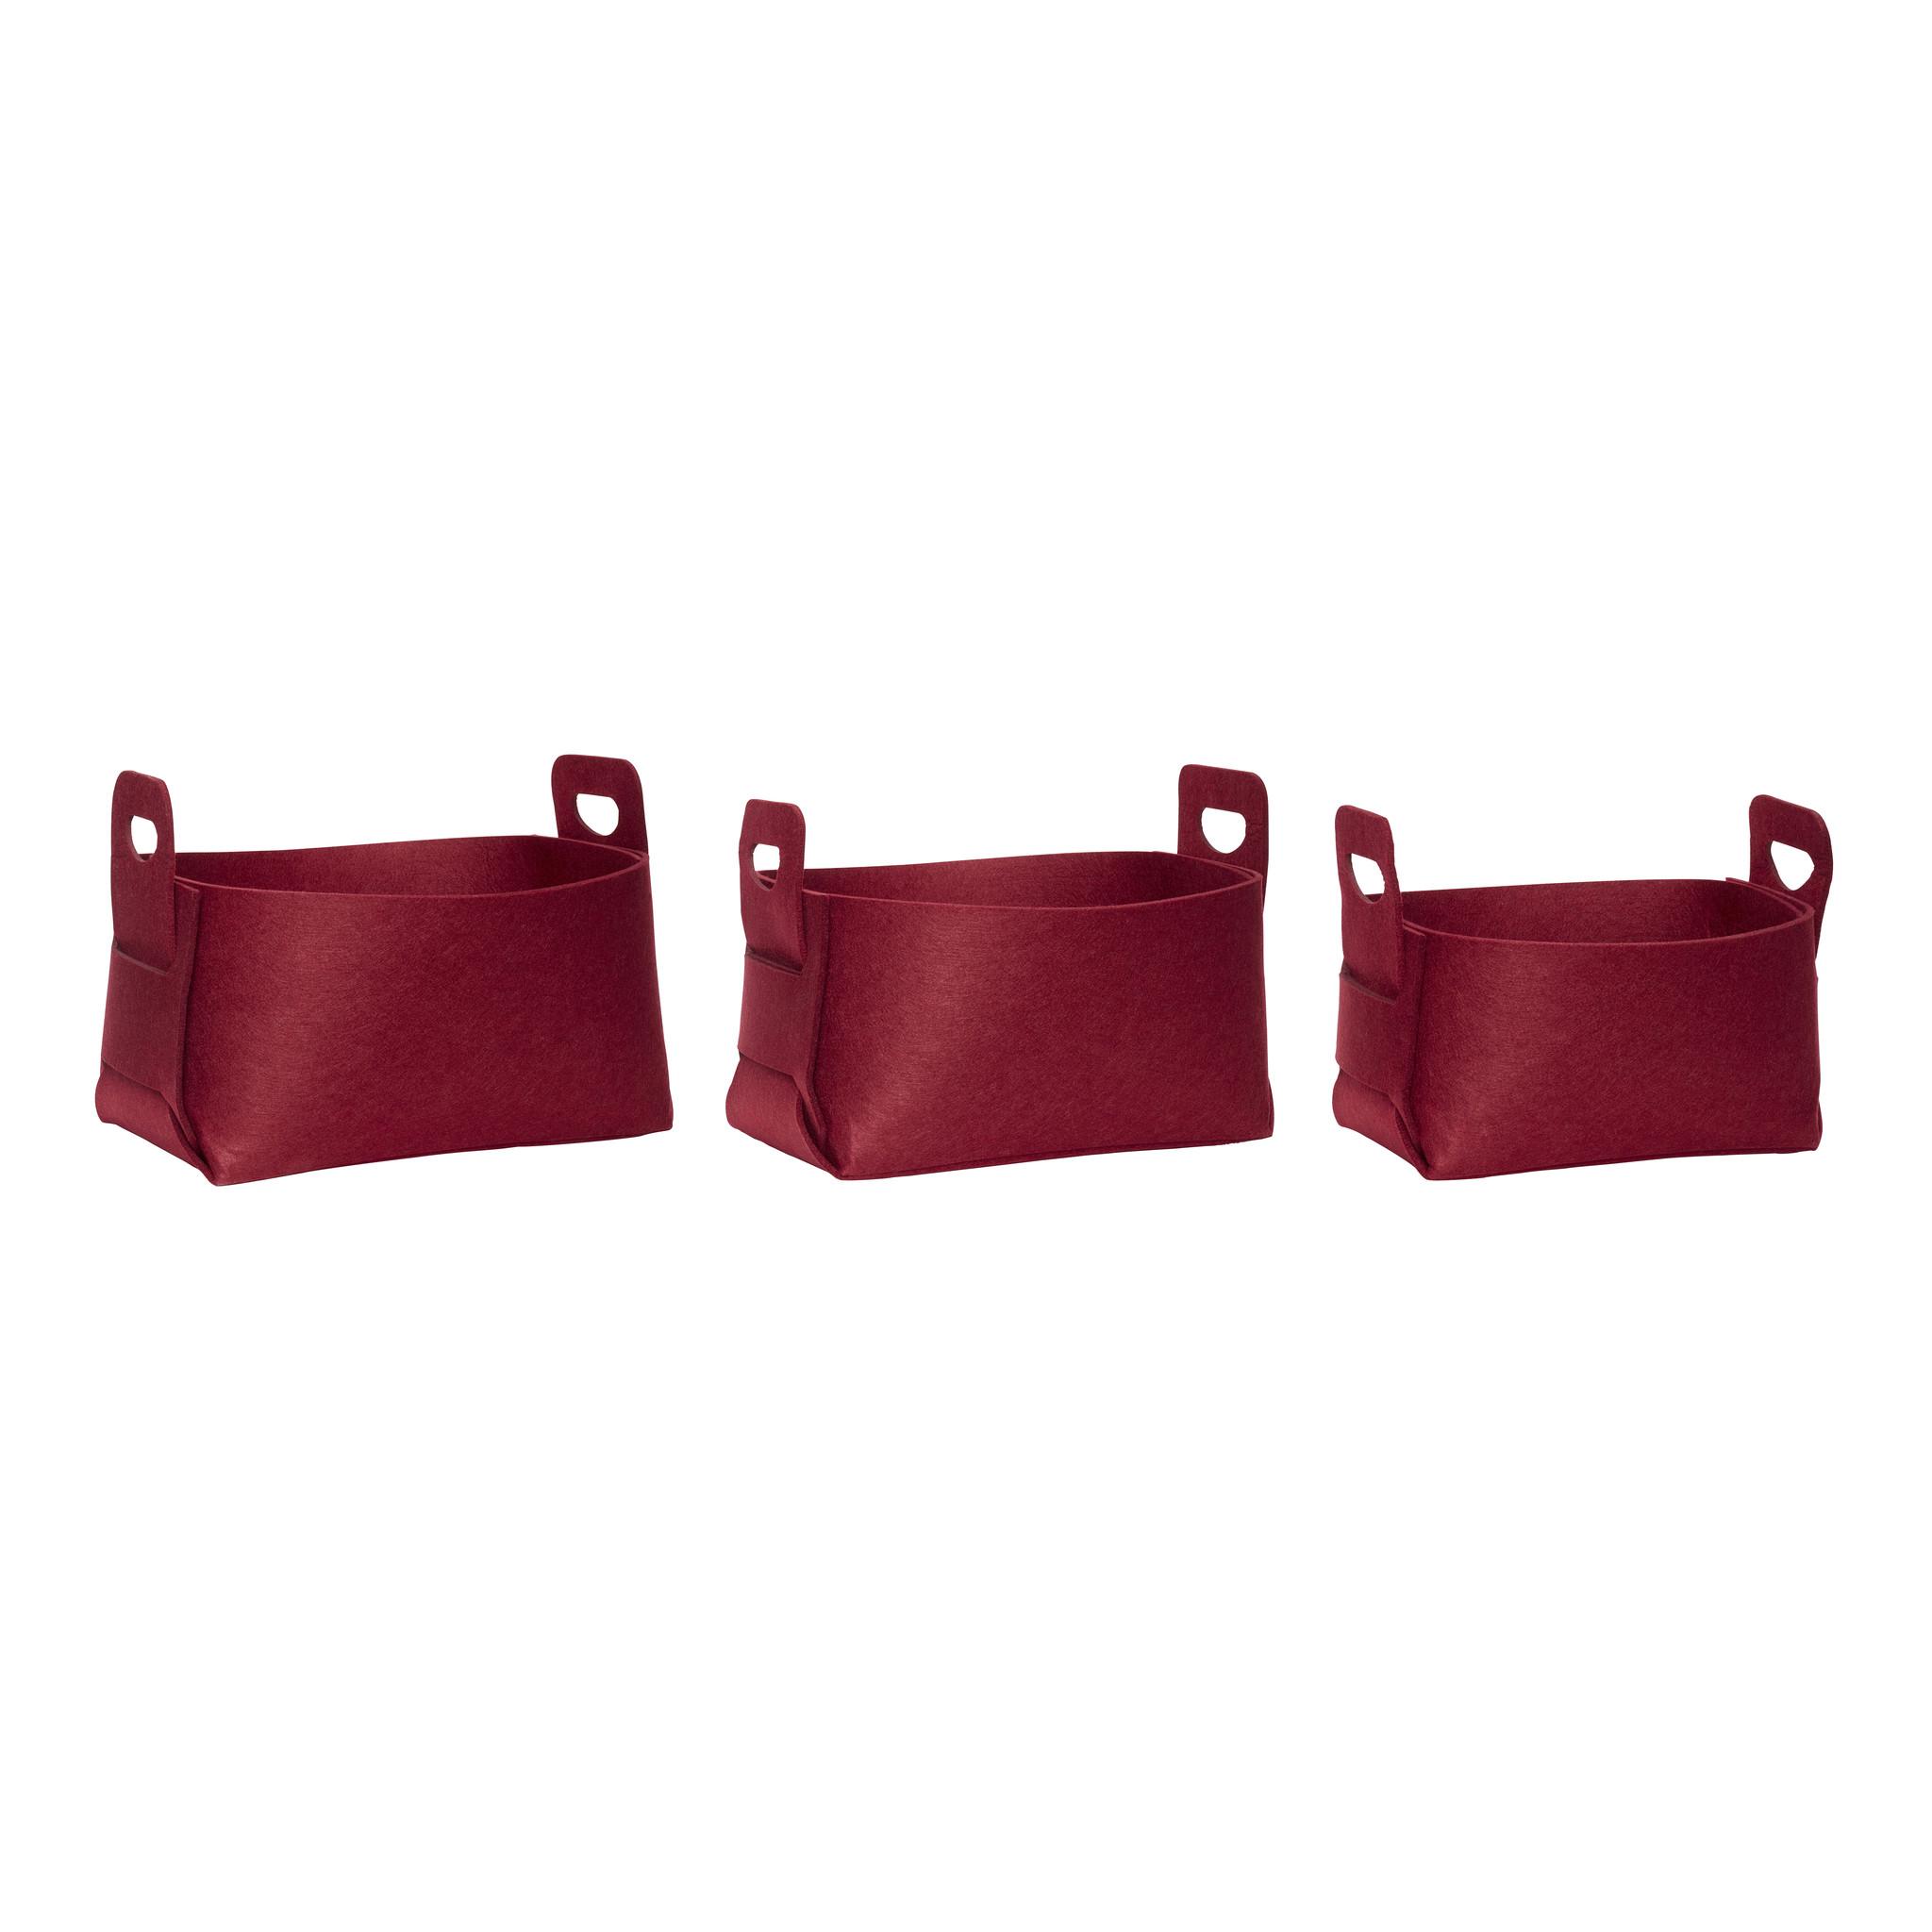 Hubsch Viltmand, vierkant, rood, set van 3